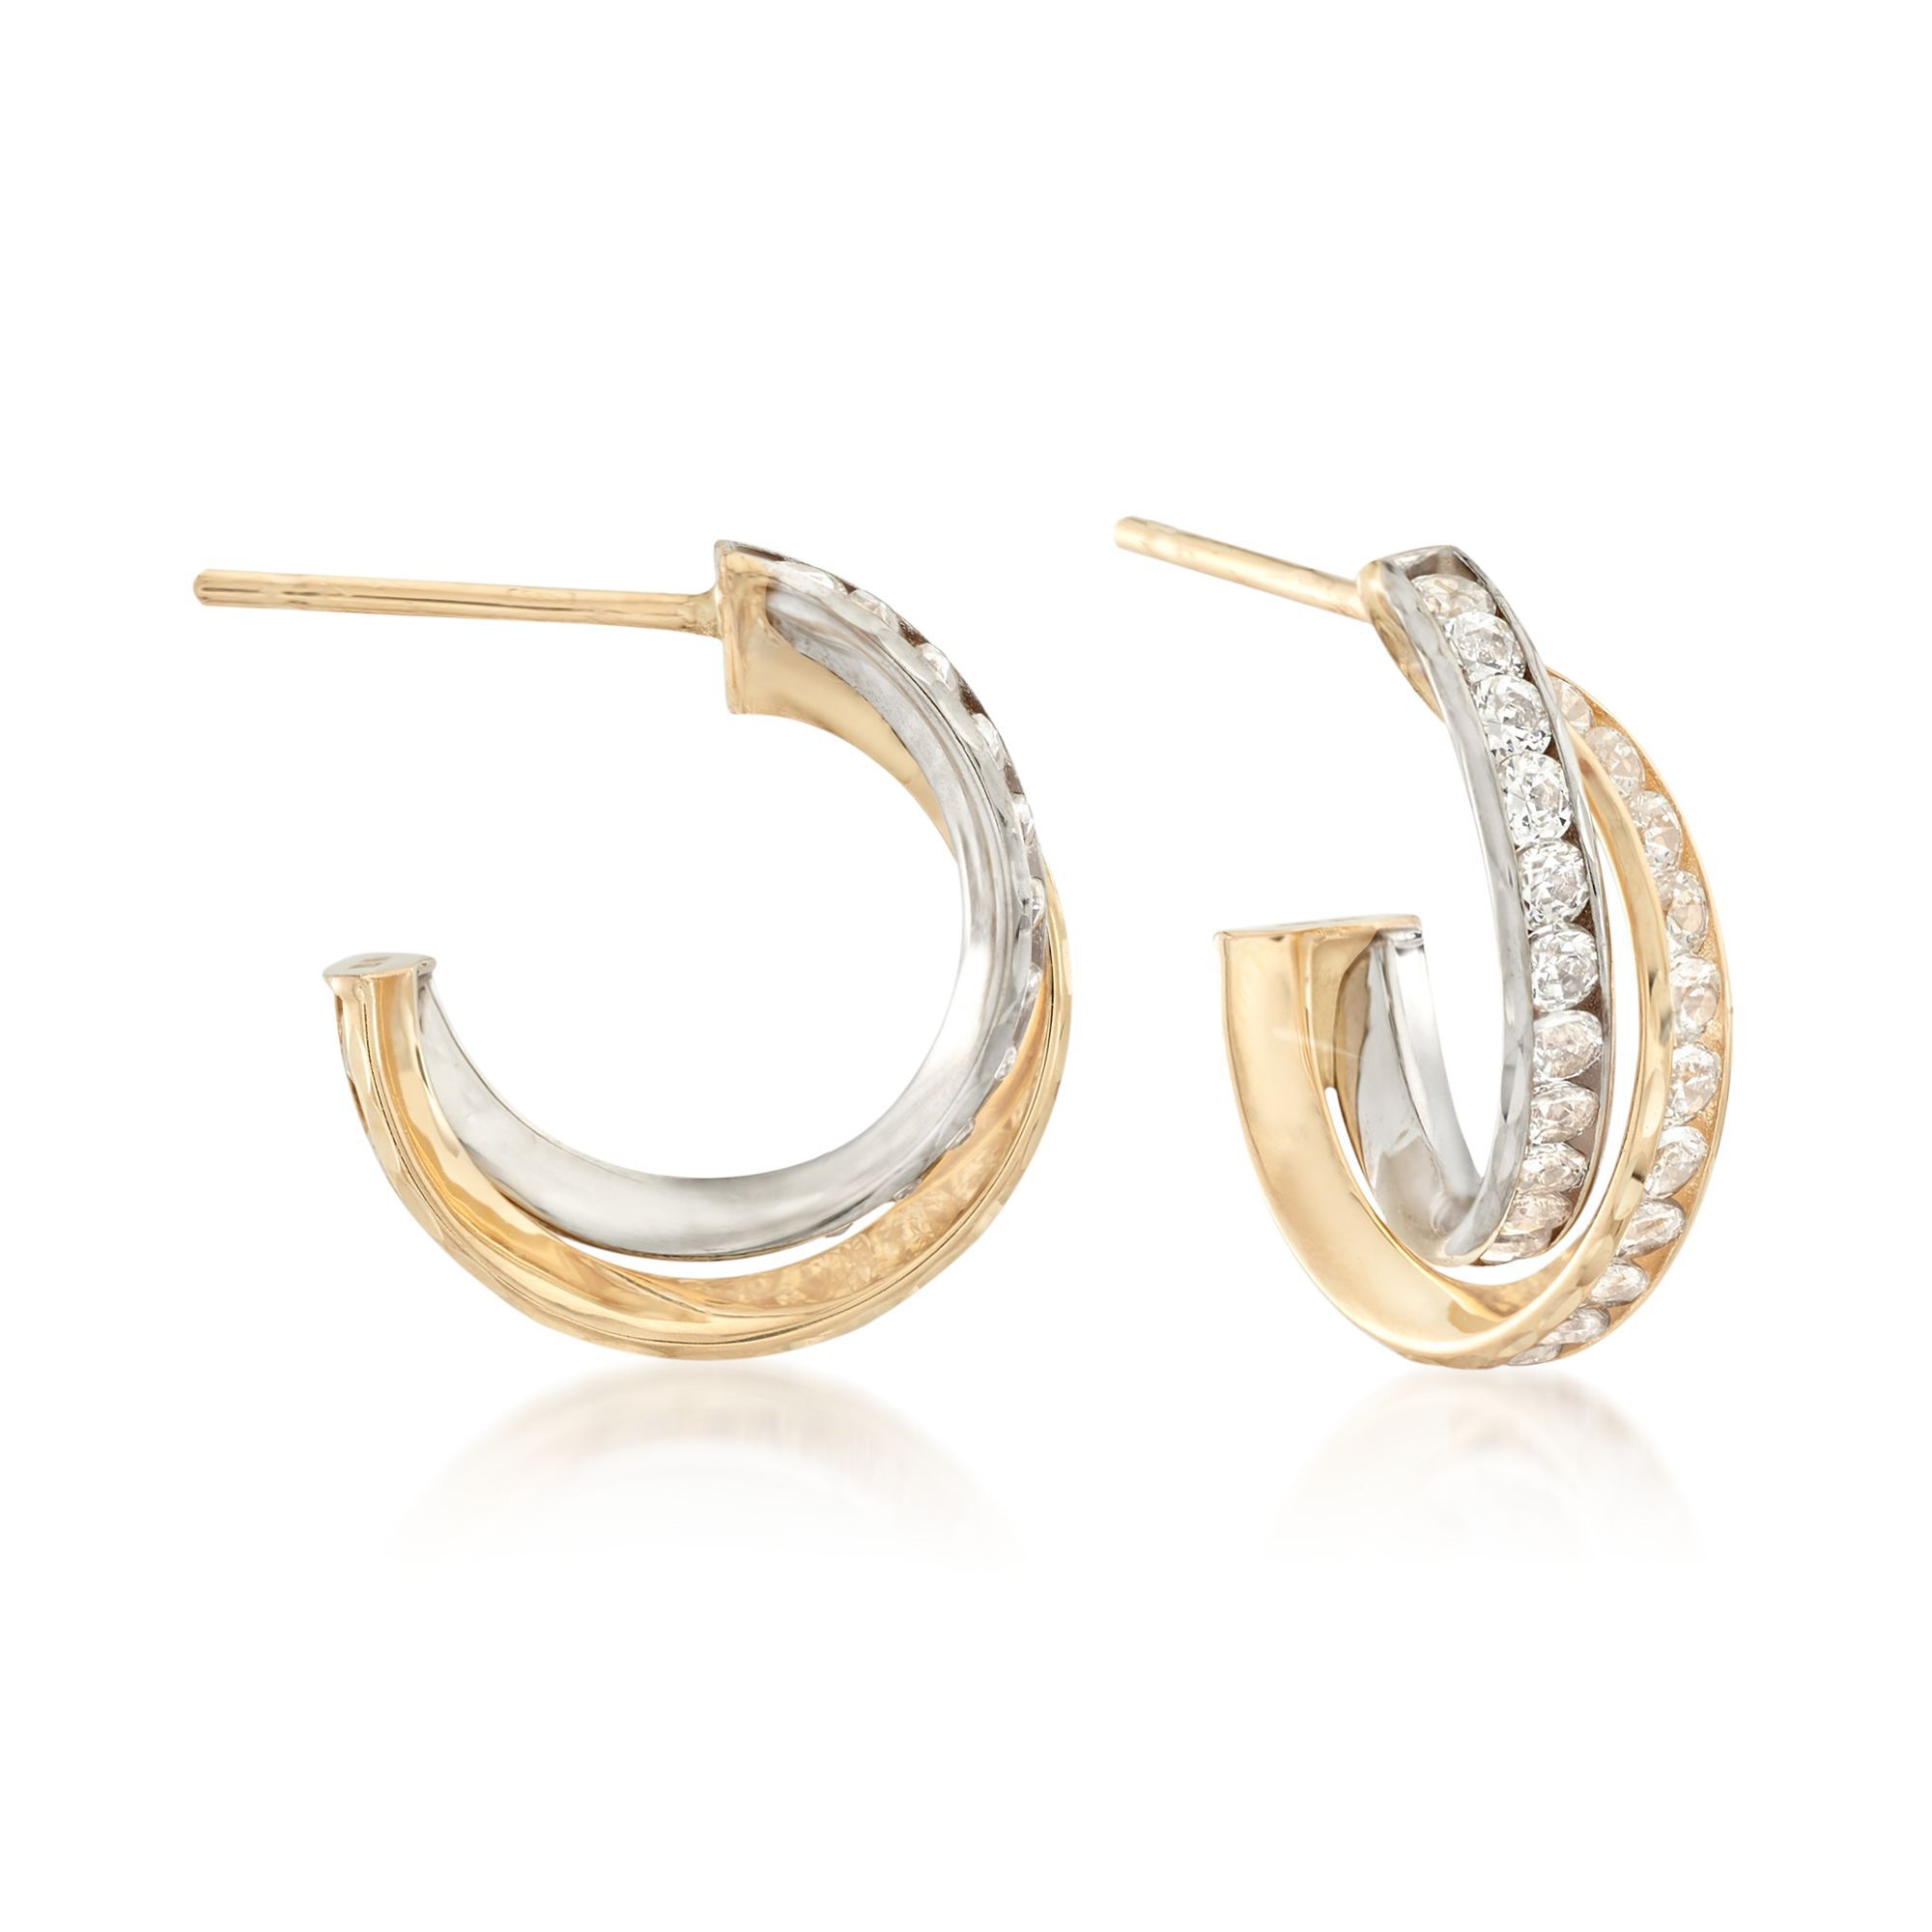 14K Yellow//White Gold Huggie Hoop Earrings Clear 1 Row Cubic Zirconia  2 Sizes.